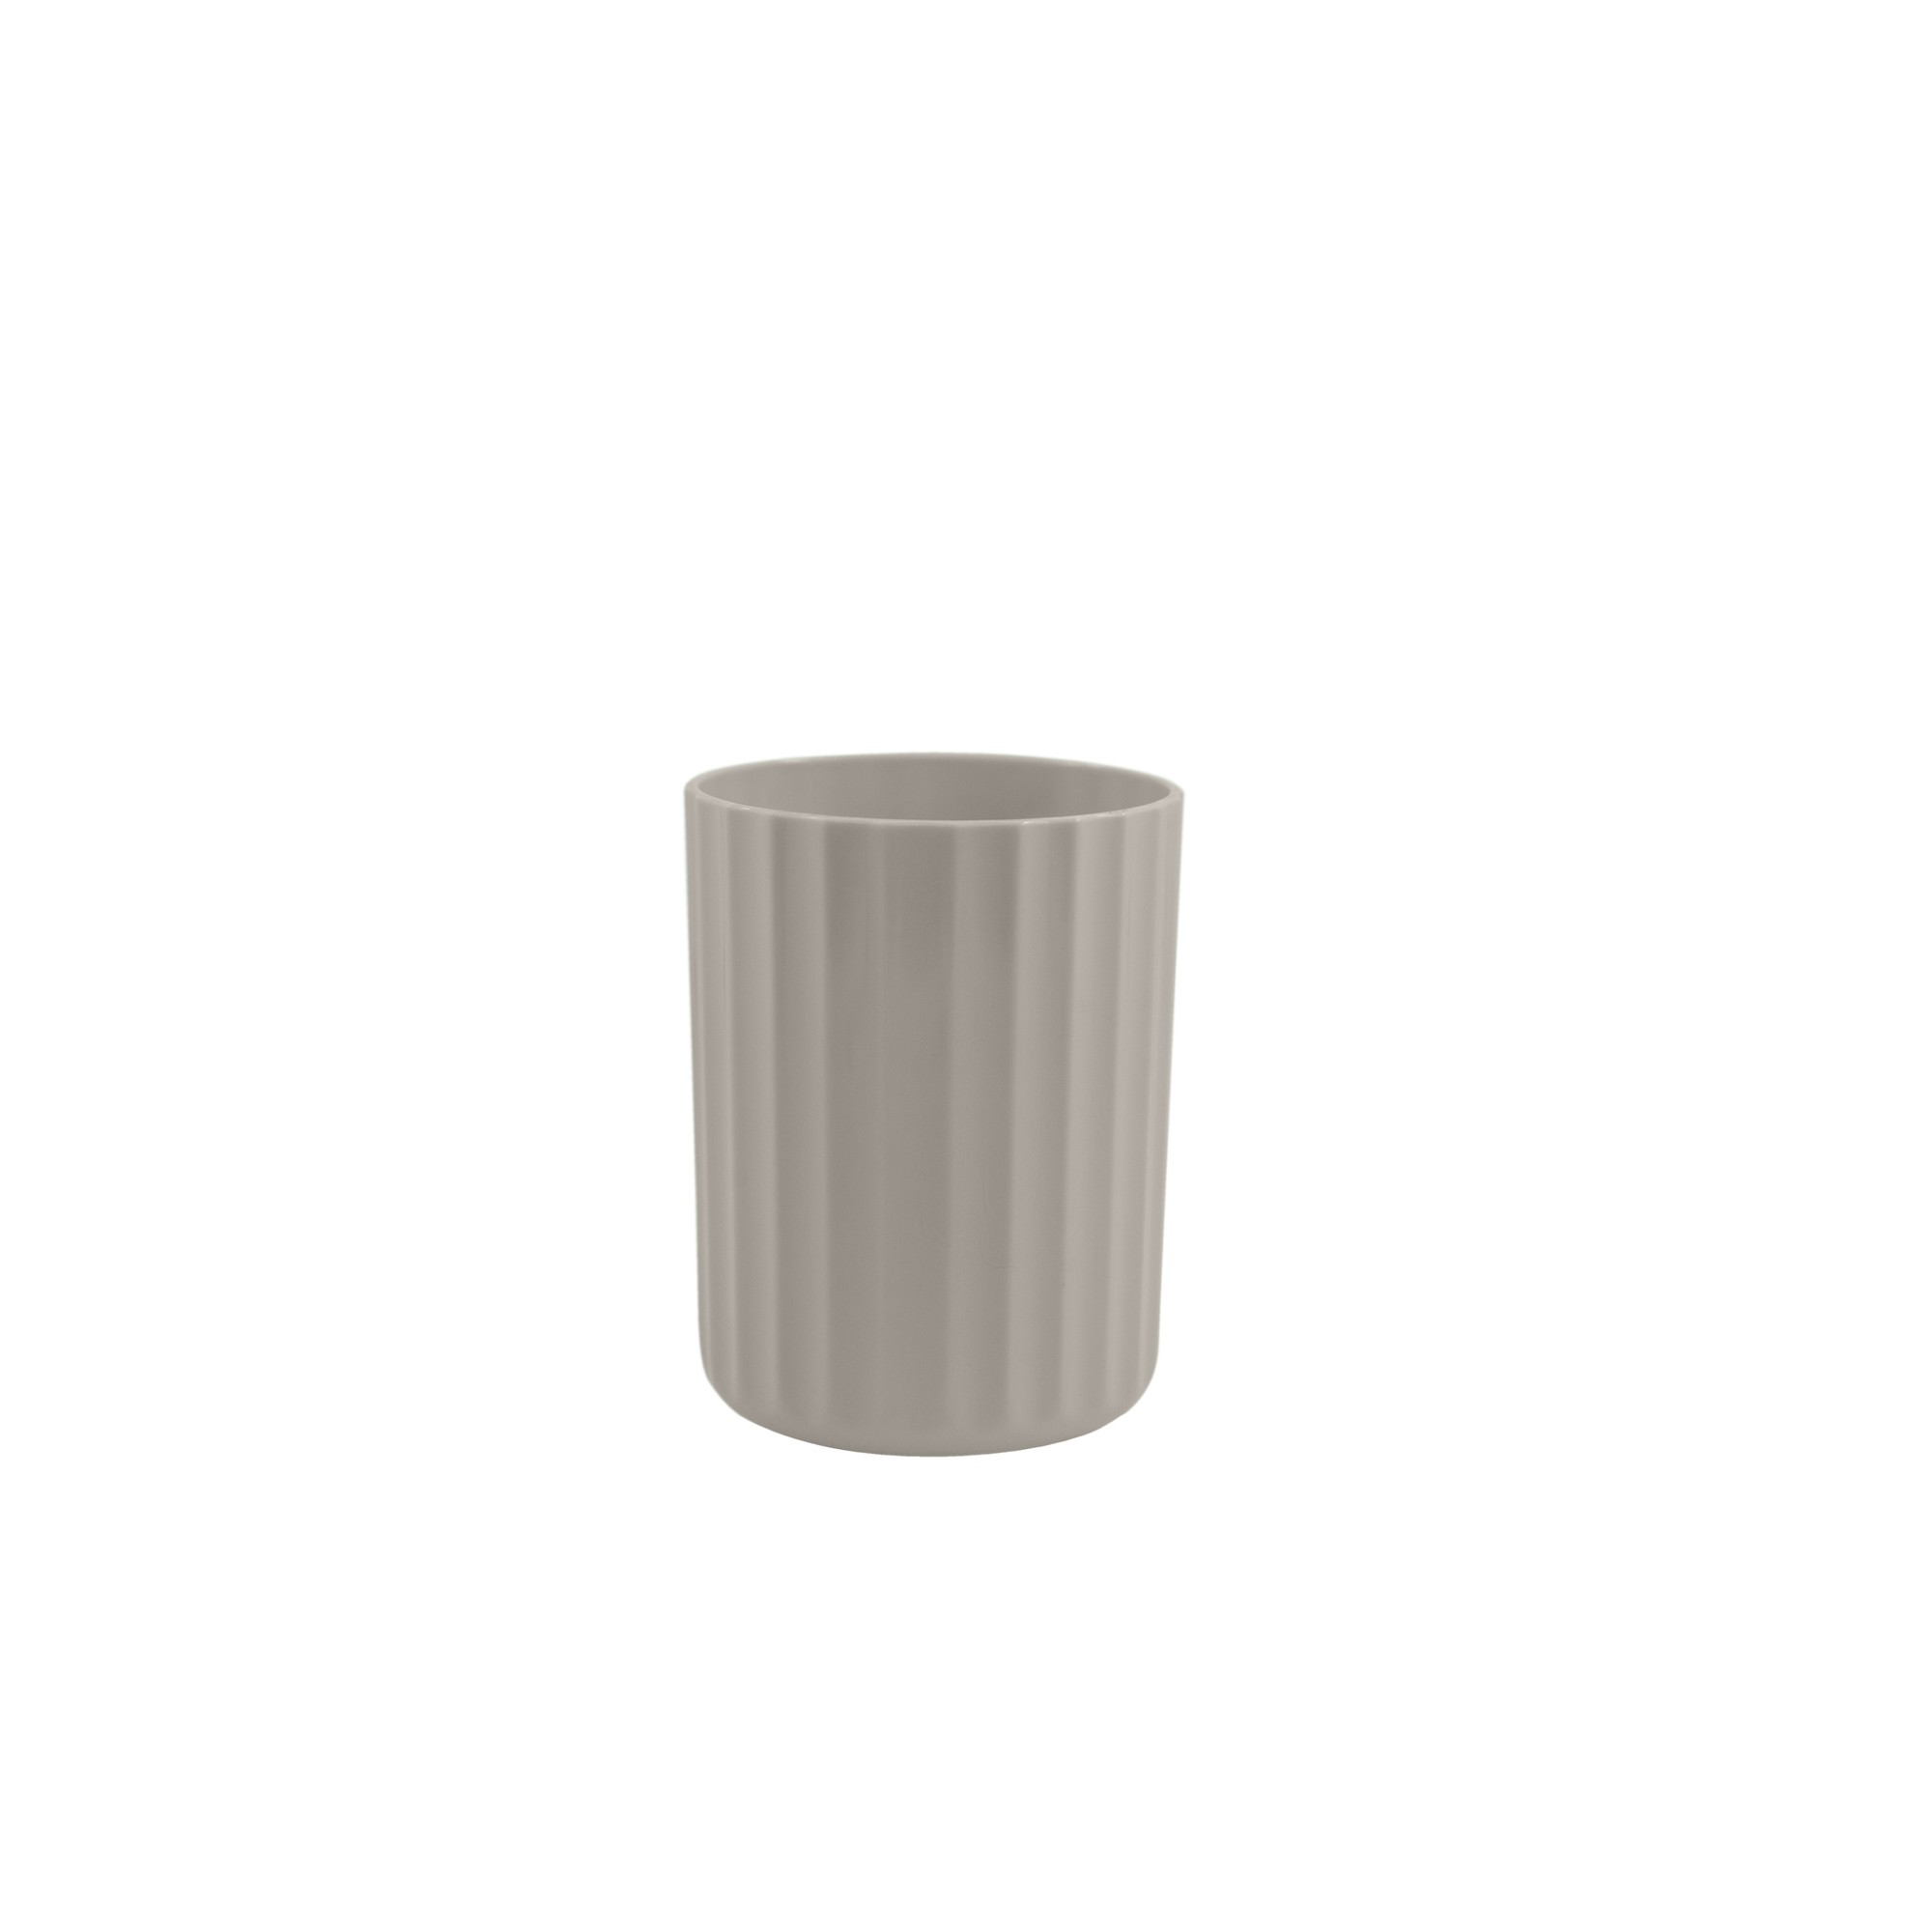 Vaso para Plantas Plastico 103x79 cm Groove Bege - Ou